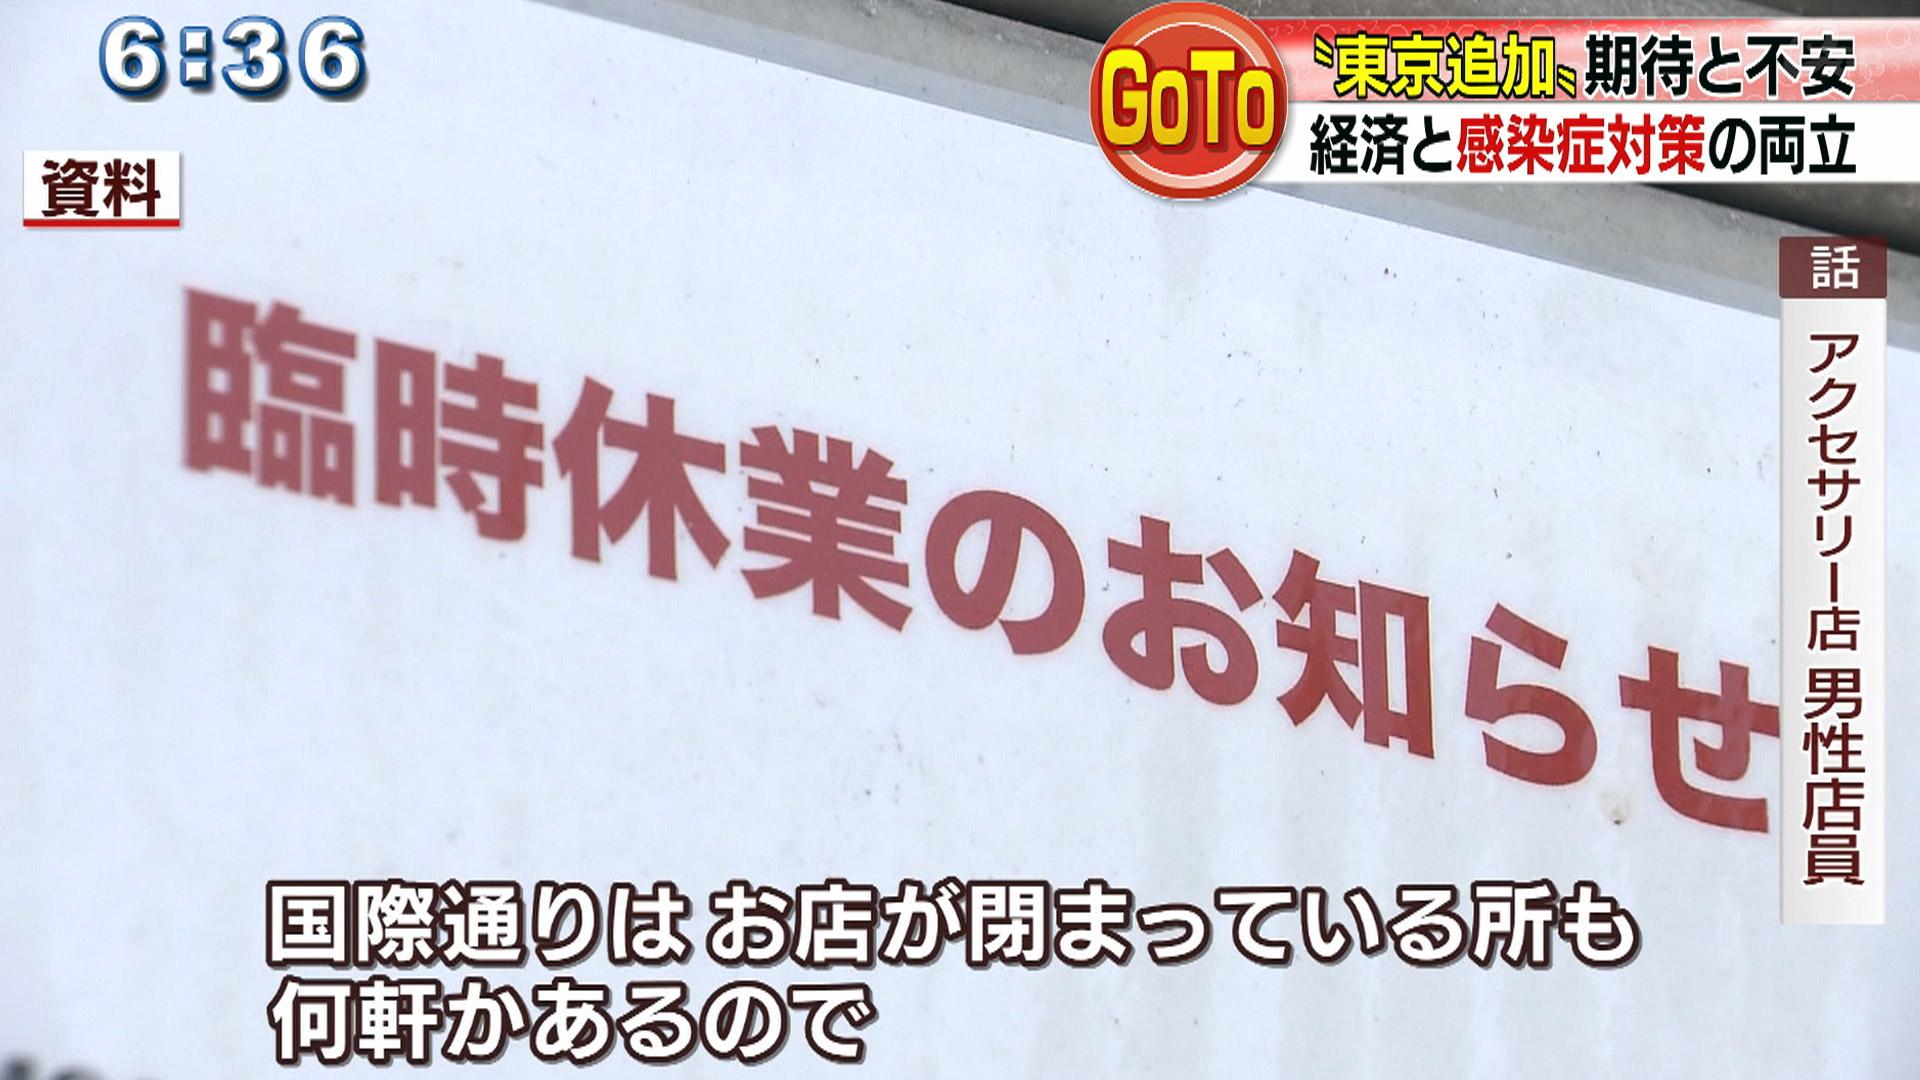 Go To トラベル「東京追加」で期待と不安